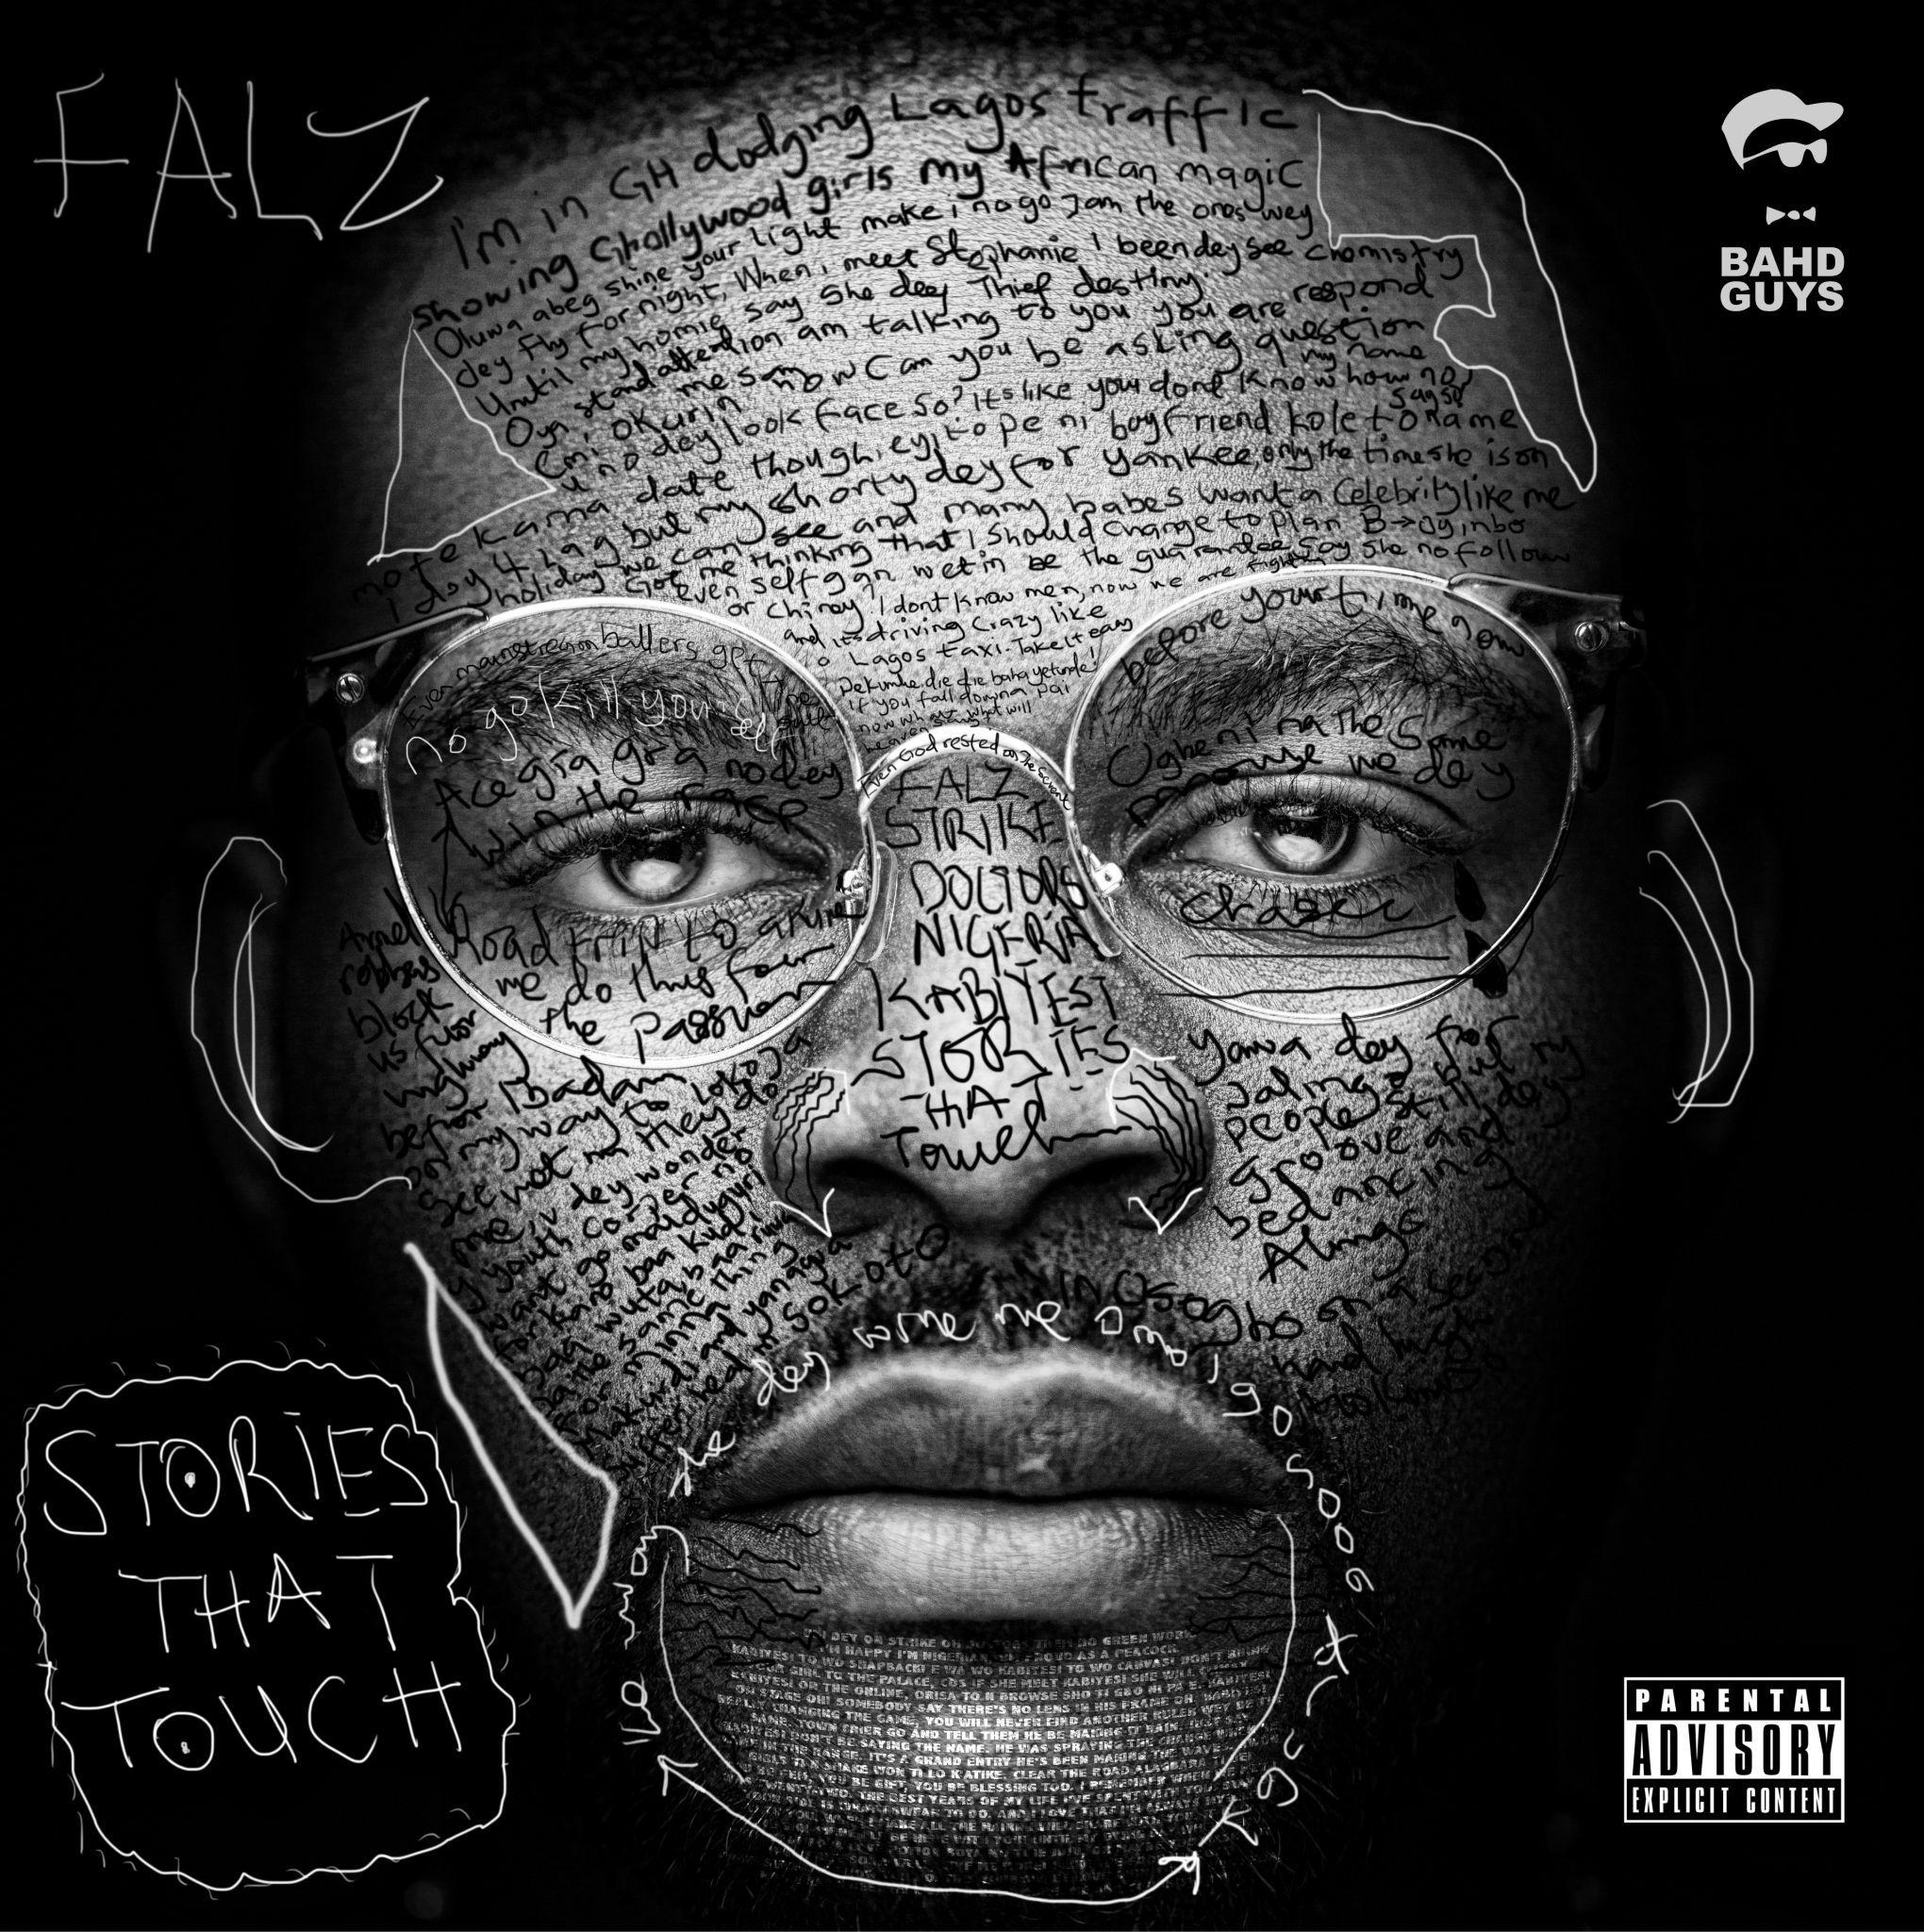 Falz-Stories-That-Touch-Album-Cover